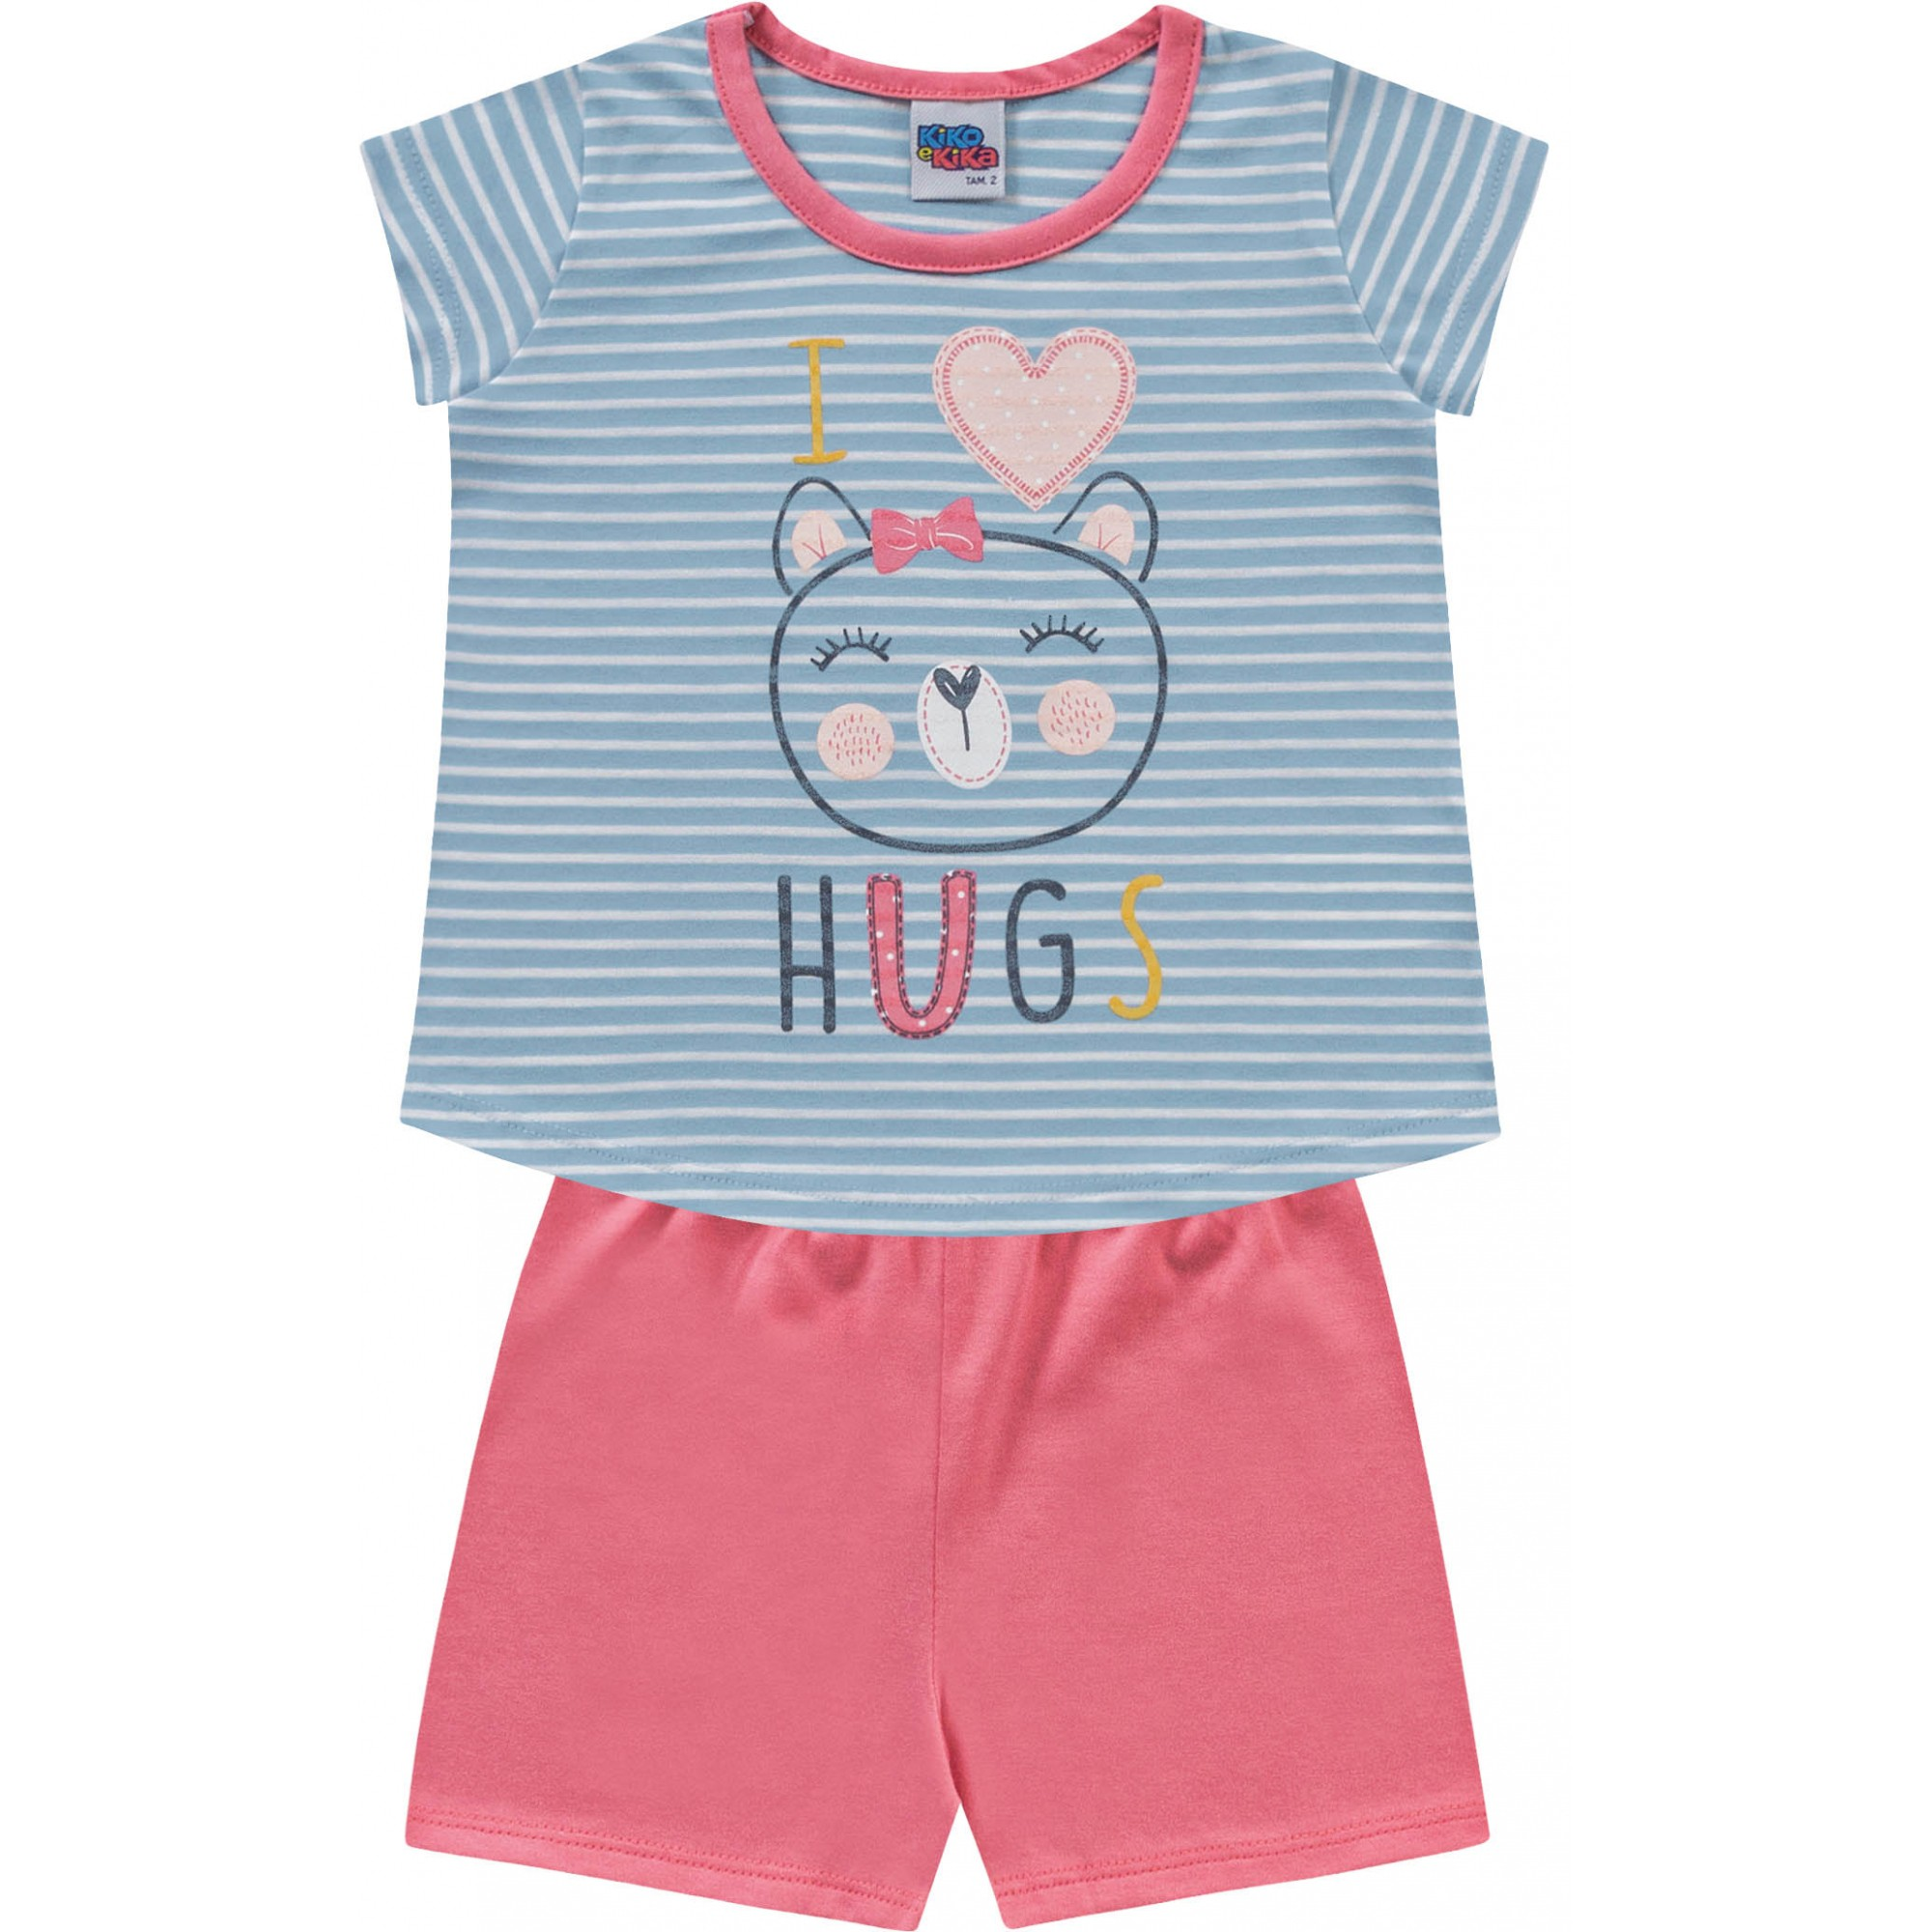 Pijama Hugs Azul Kiko e Kika